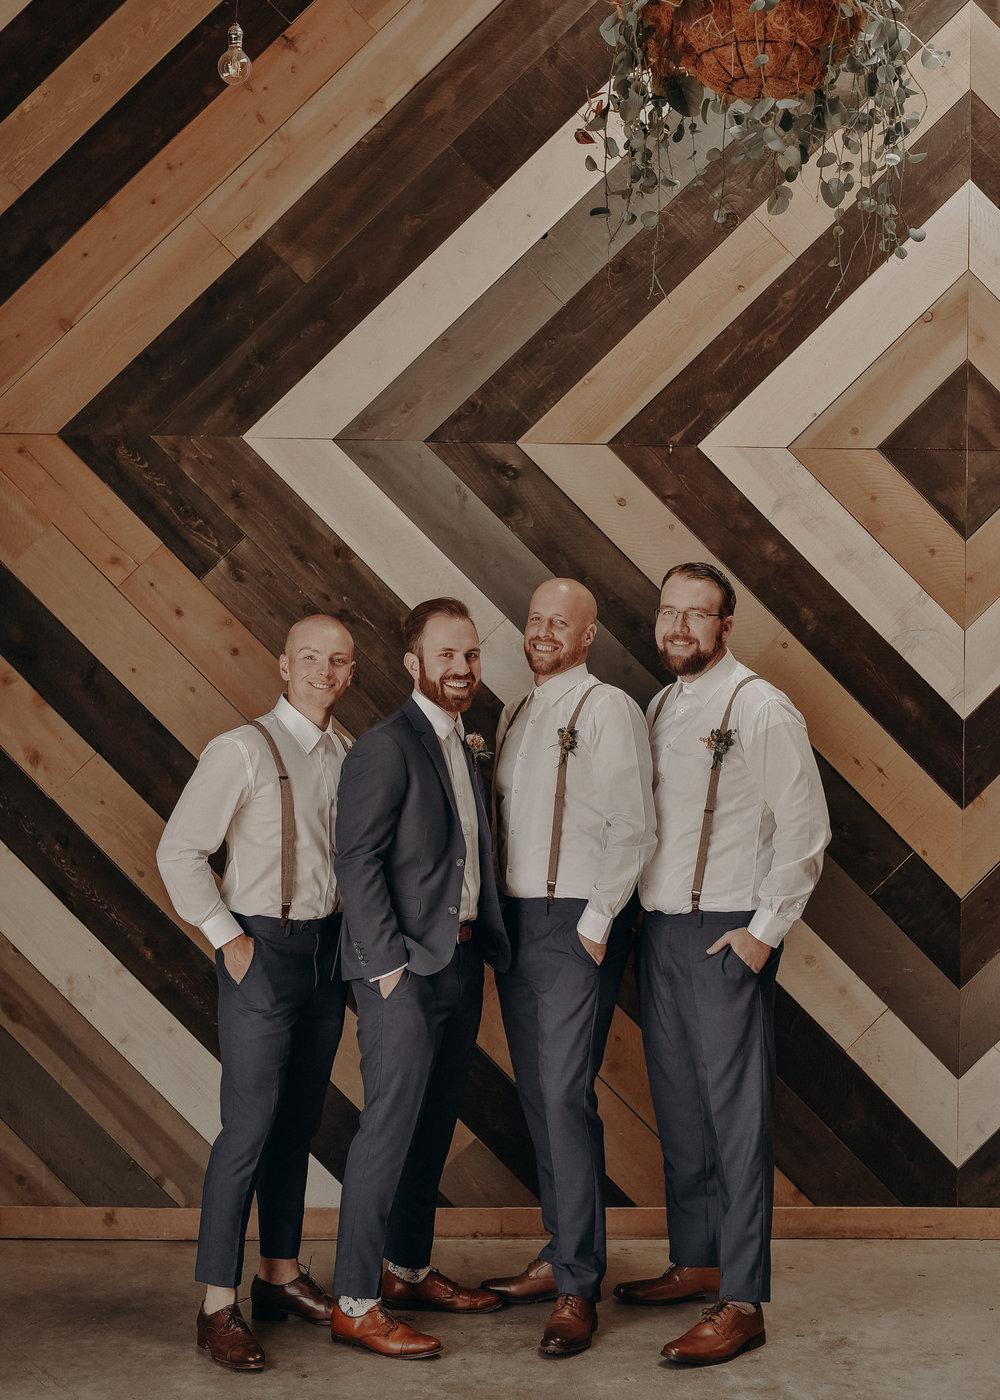 Los Angeles Wedding Photographers - The Woodshed Venue Wedding-033.jpg